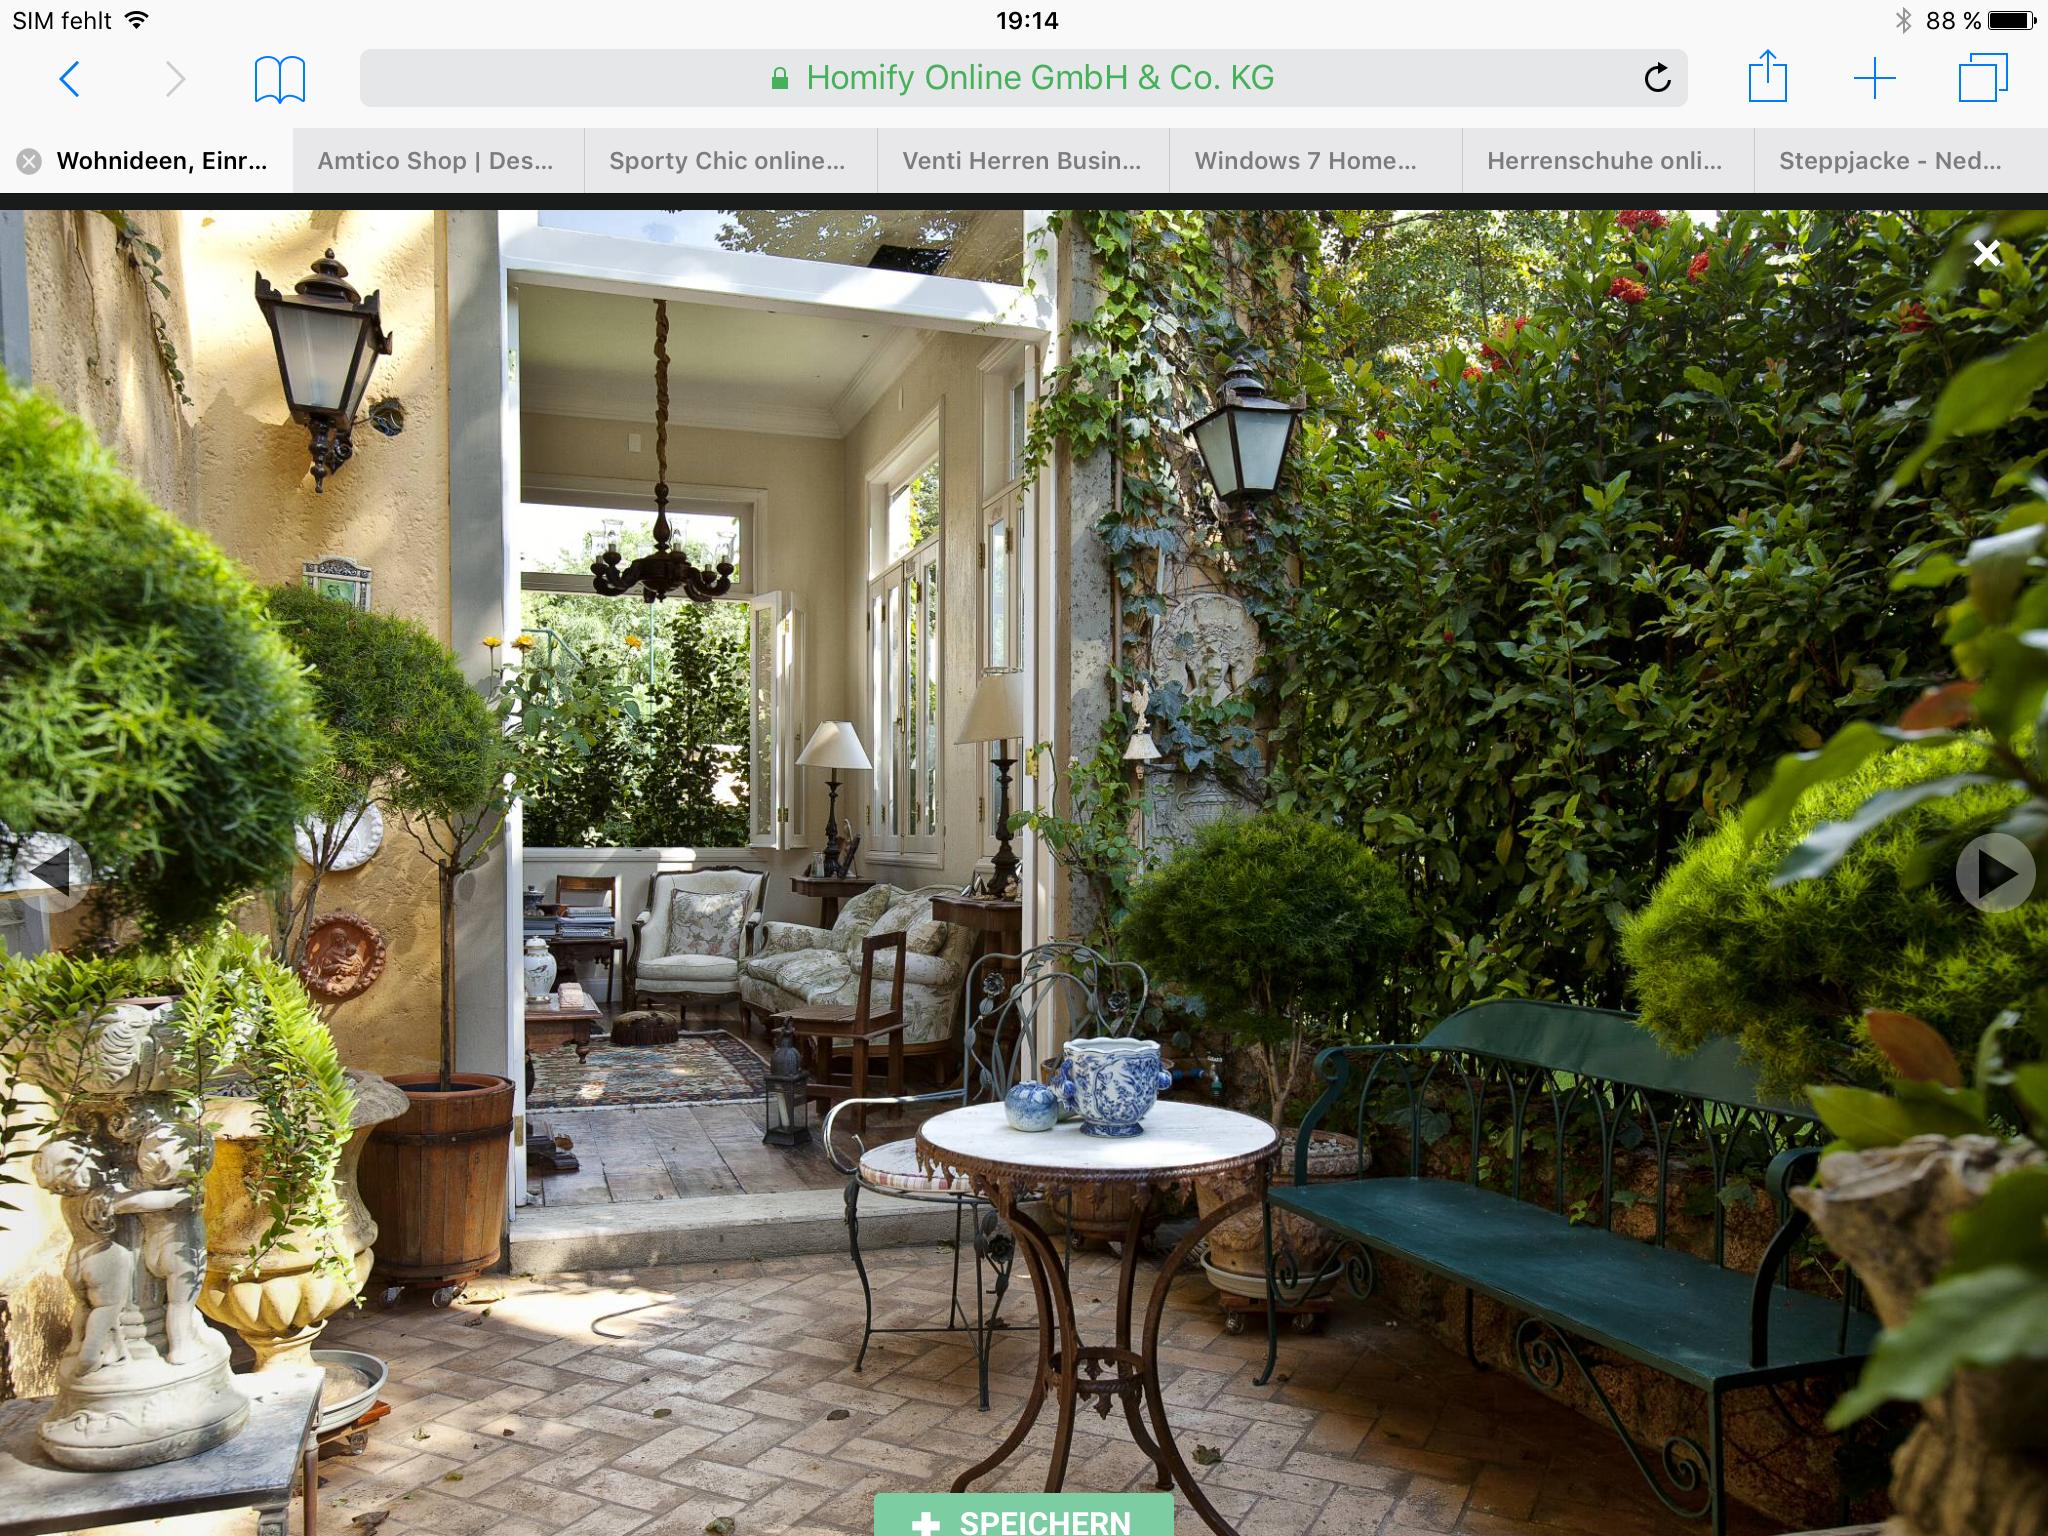 Genial Homify Garten Foto Von Patio, Garten, Terrace, Deck, Courtyards